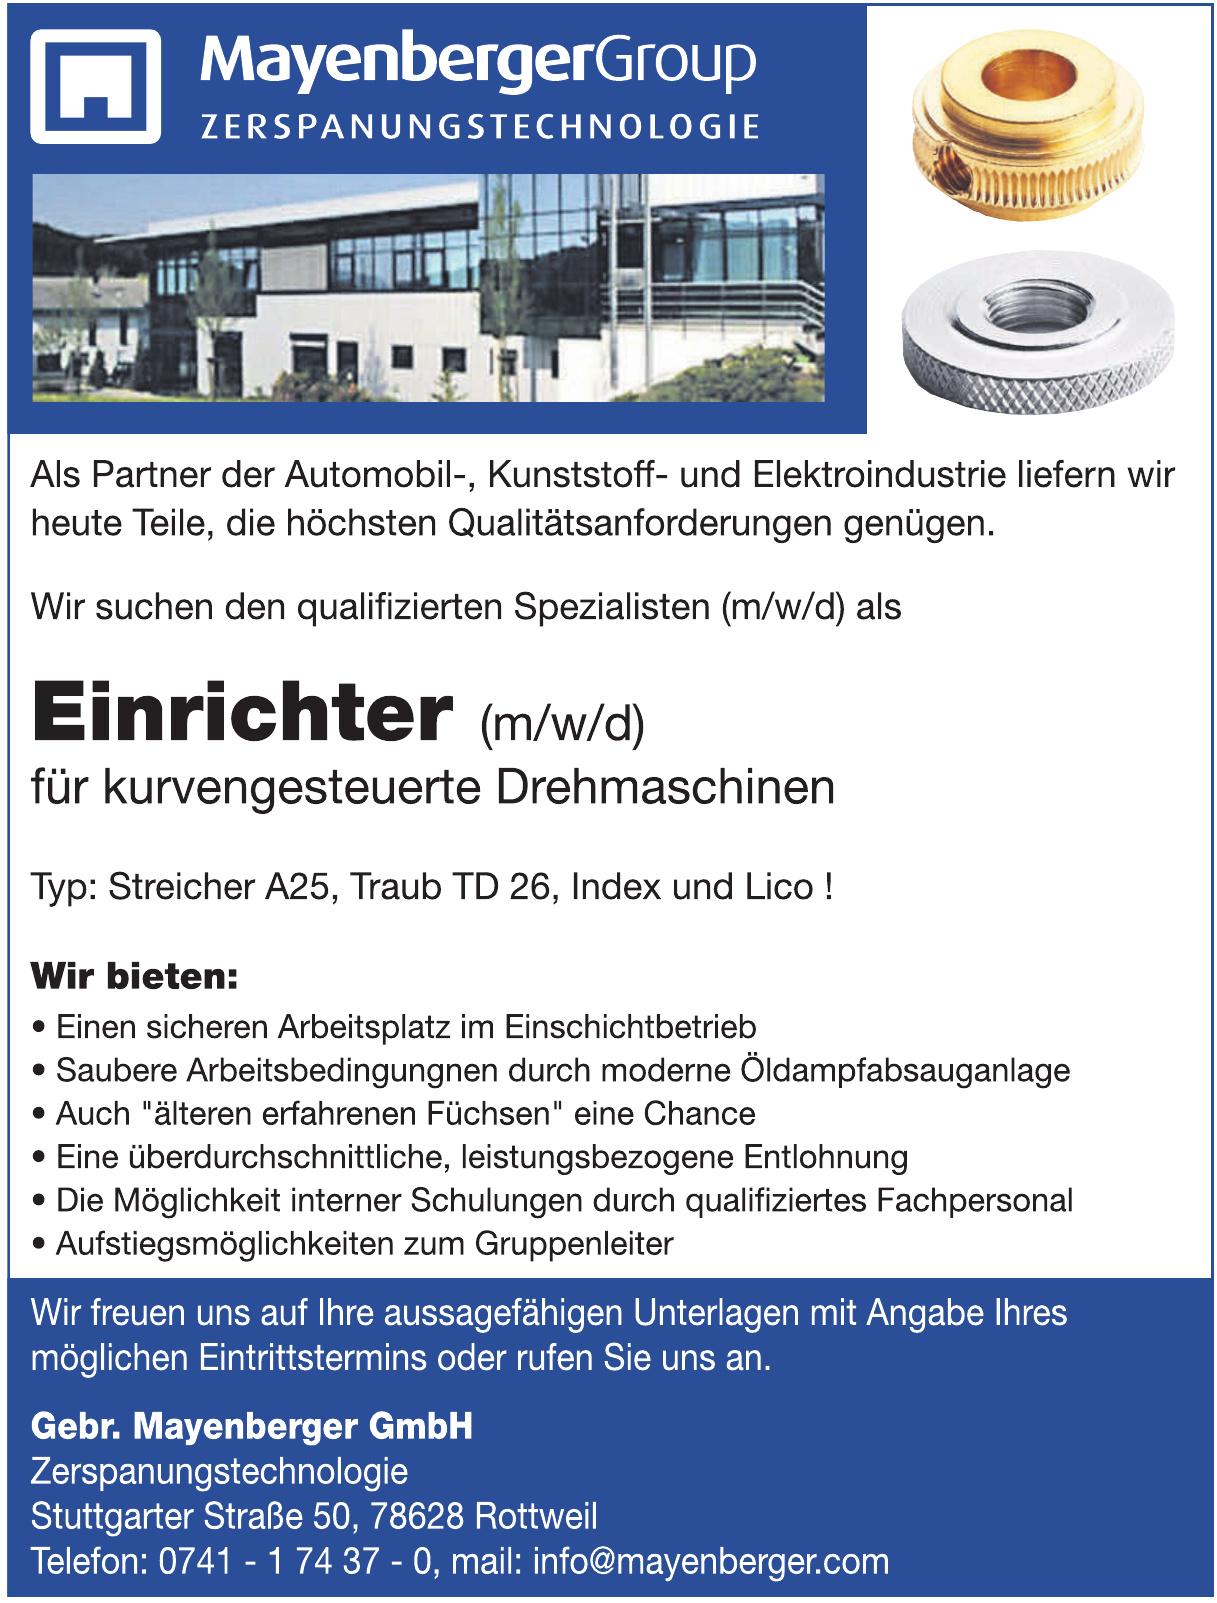 Gerb. Mayenberger GmbH